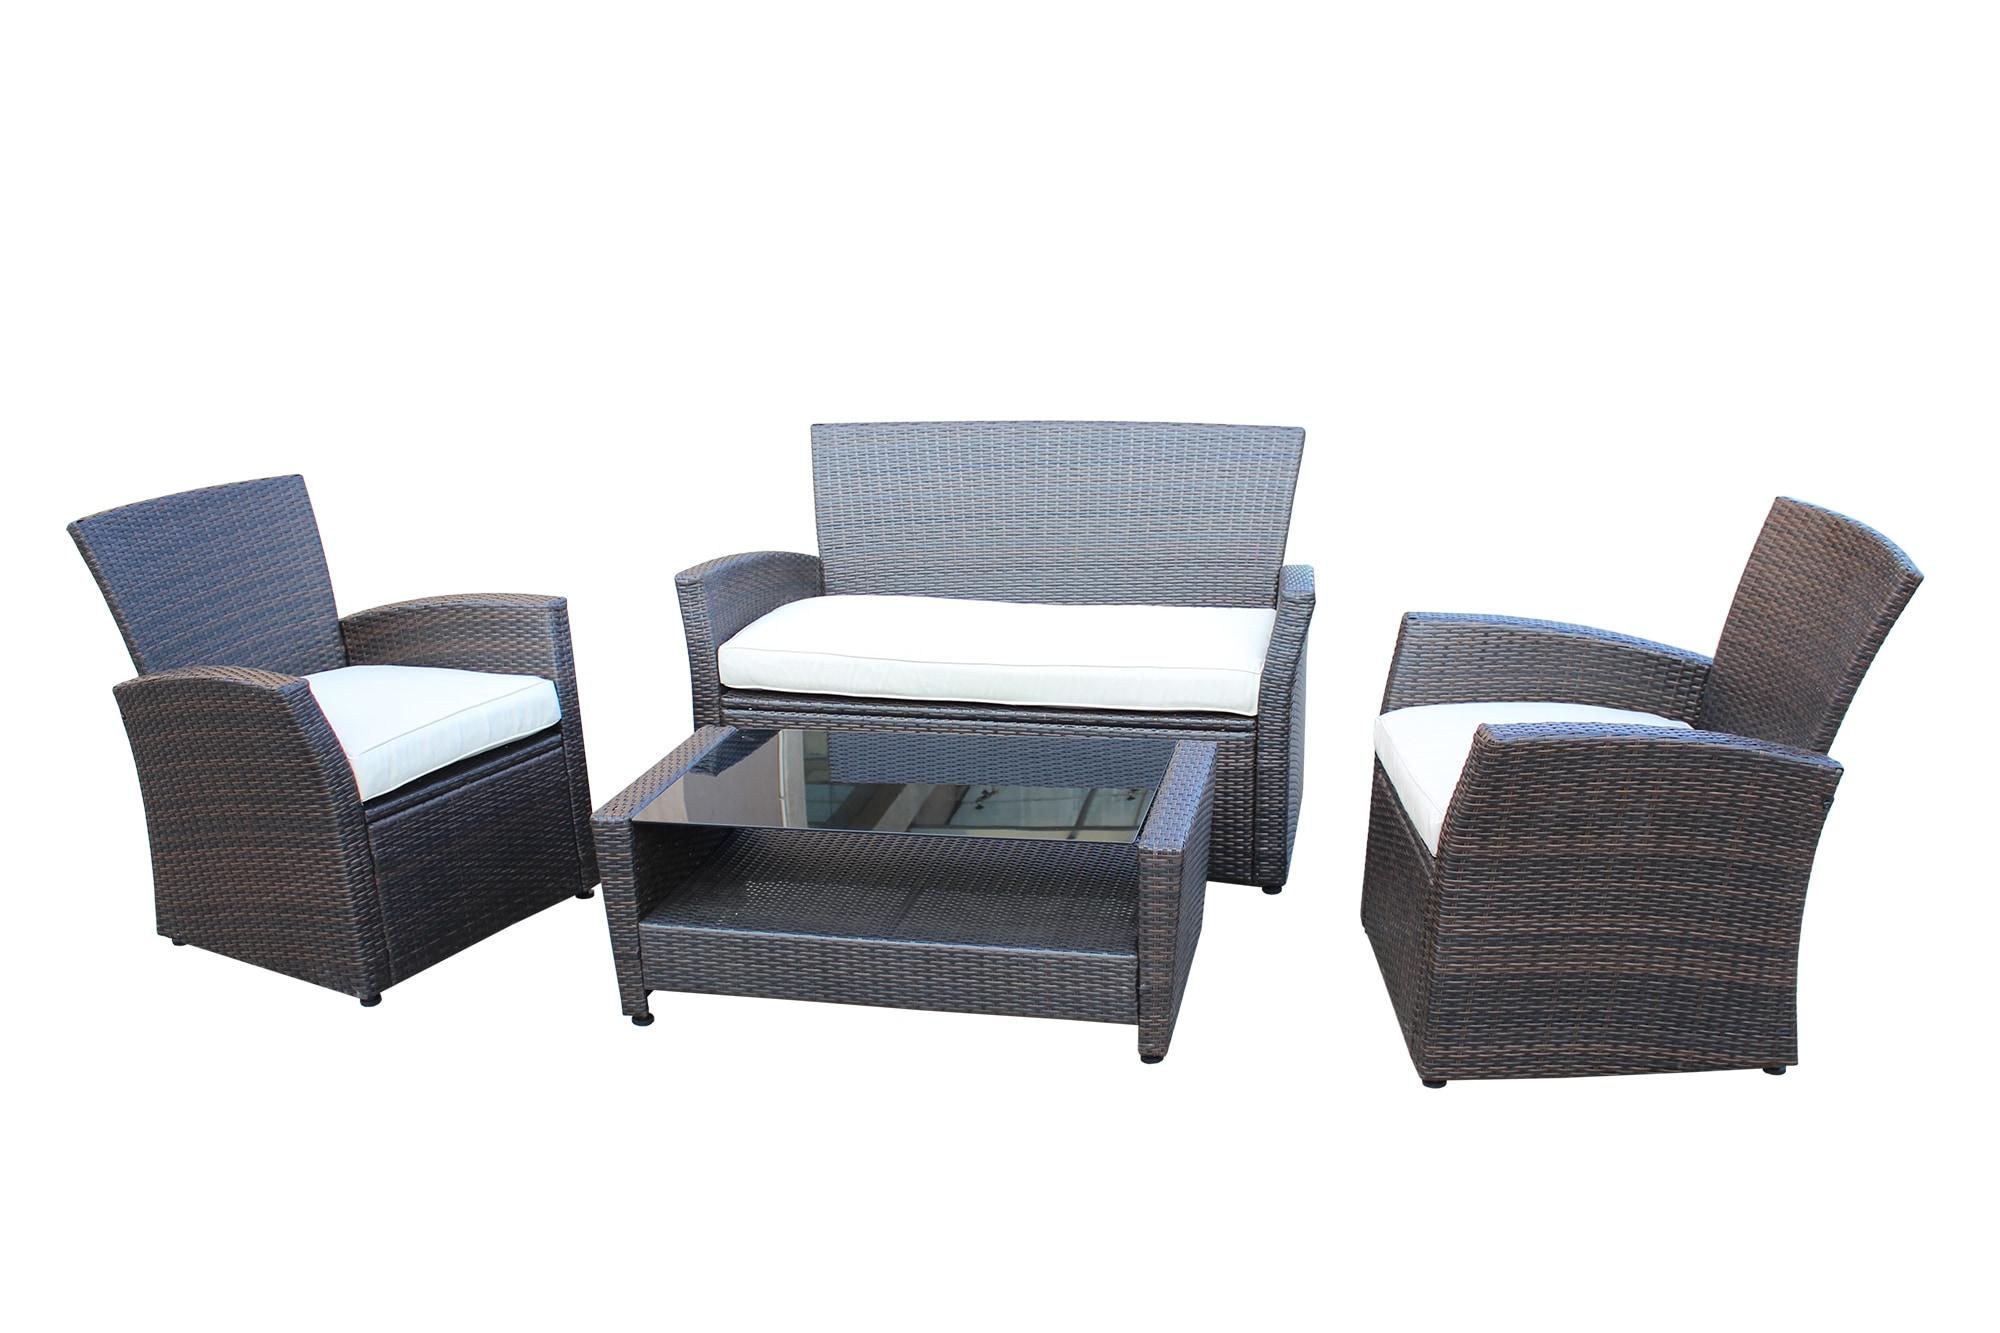 Kontiki Conversation Sets Wicker Sofa Sets Sehara 4